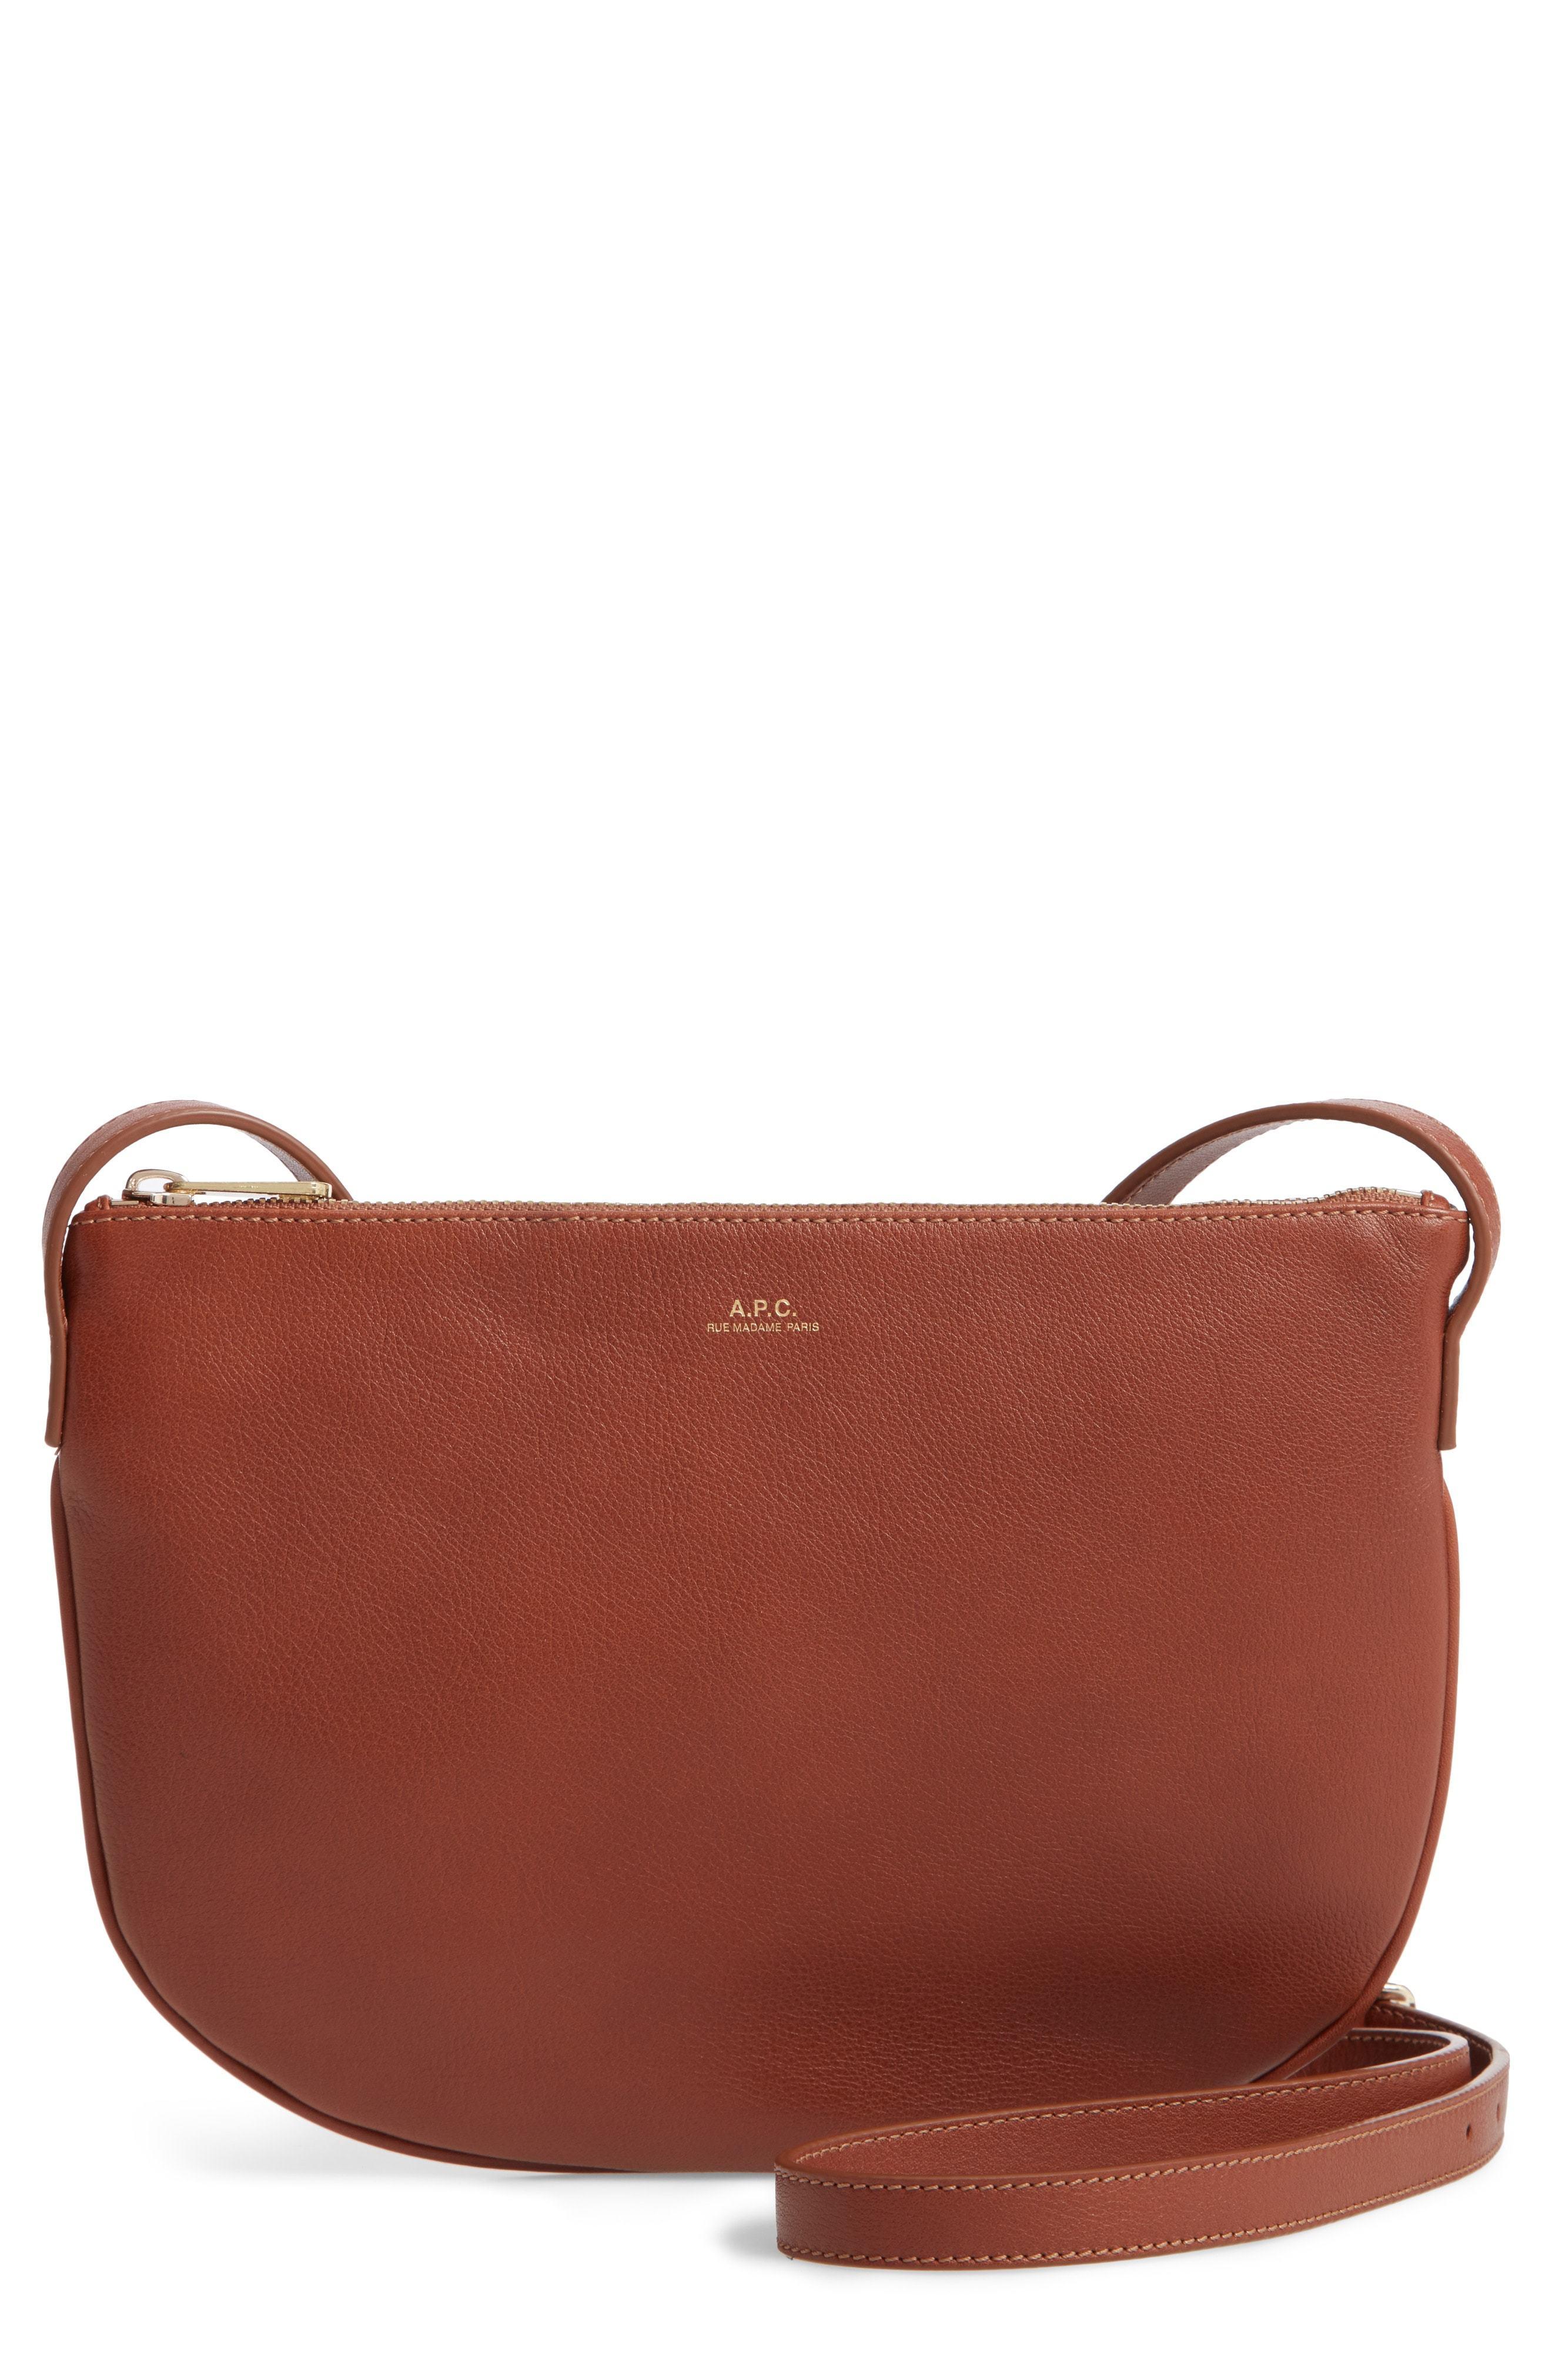 A.P.C. Sac Mlys Leather Crossbody Bag